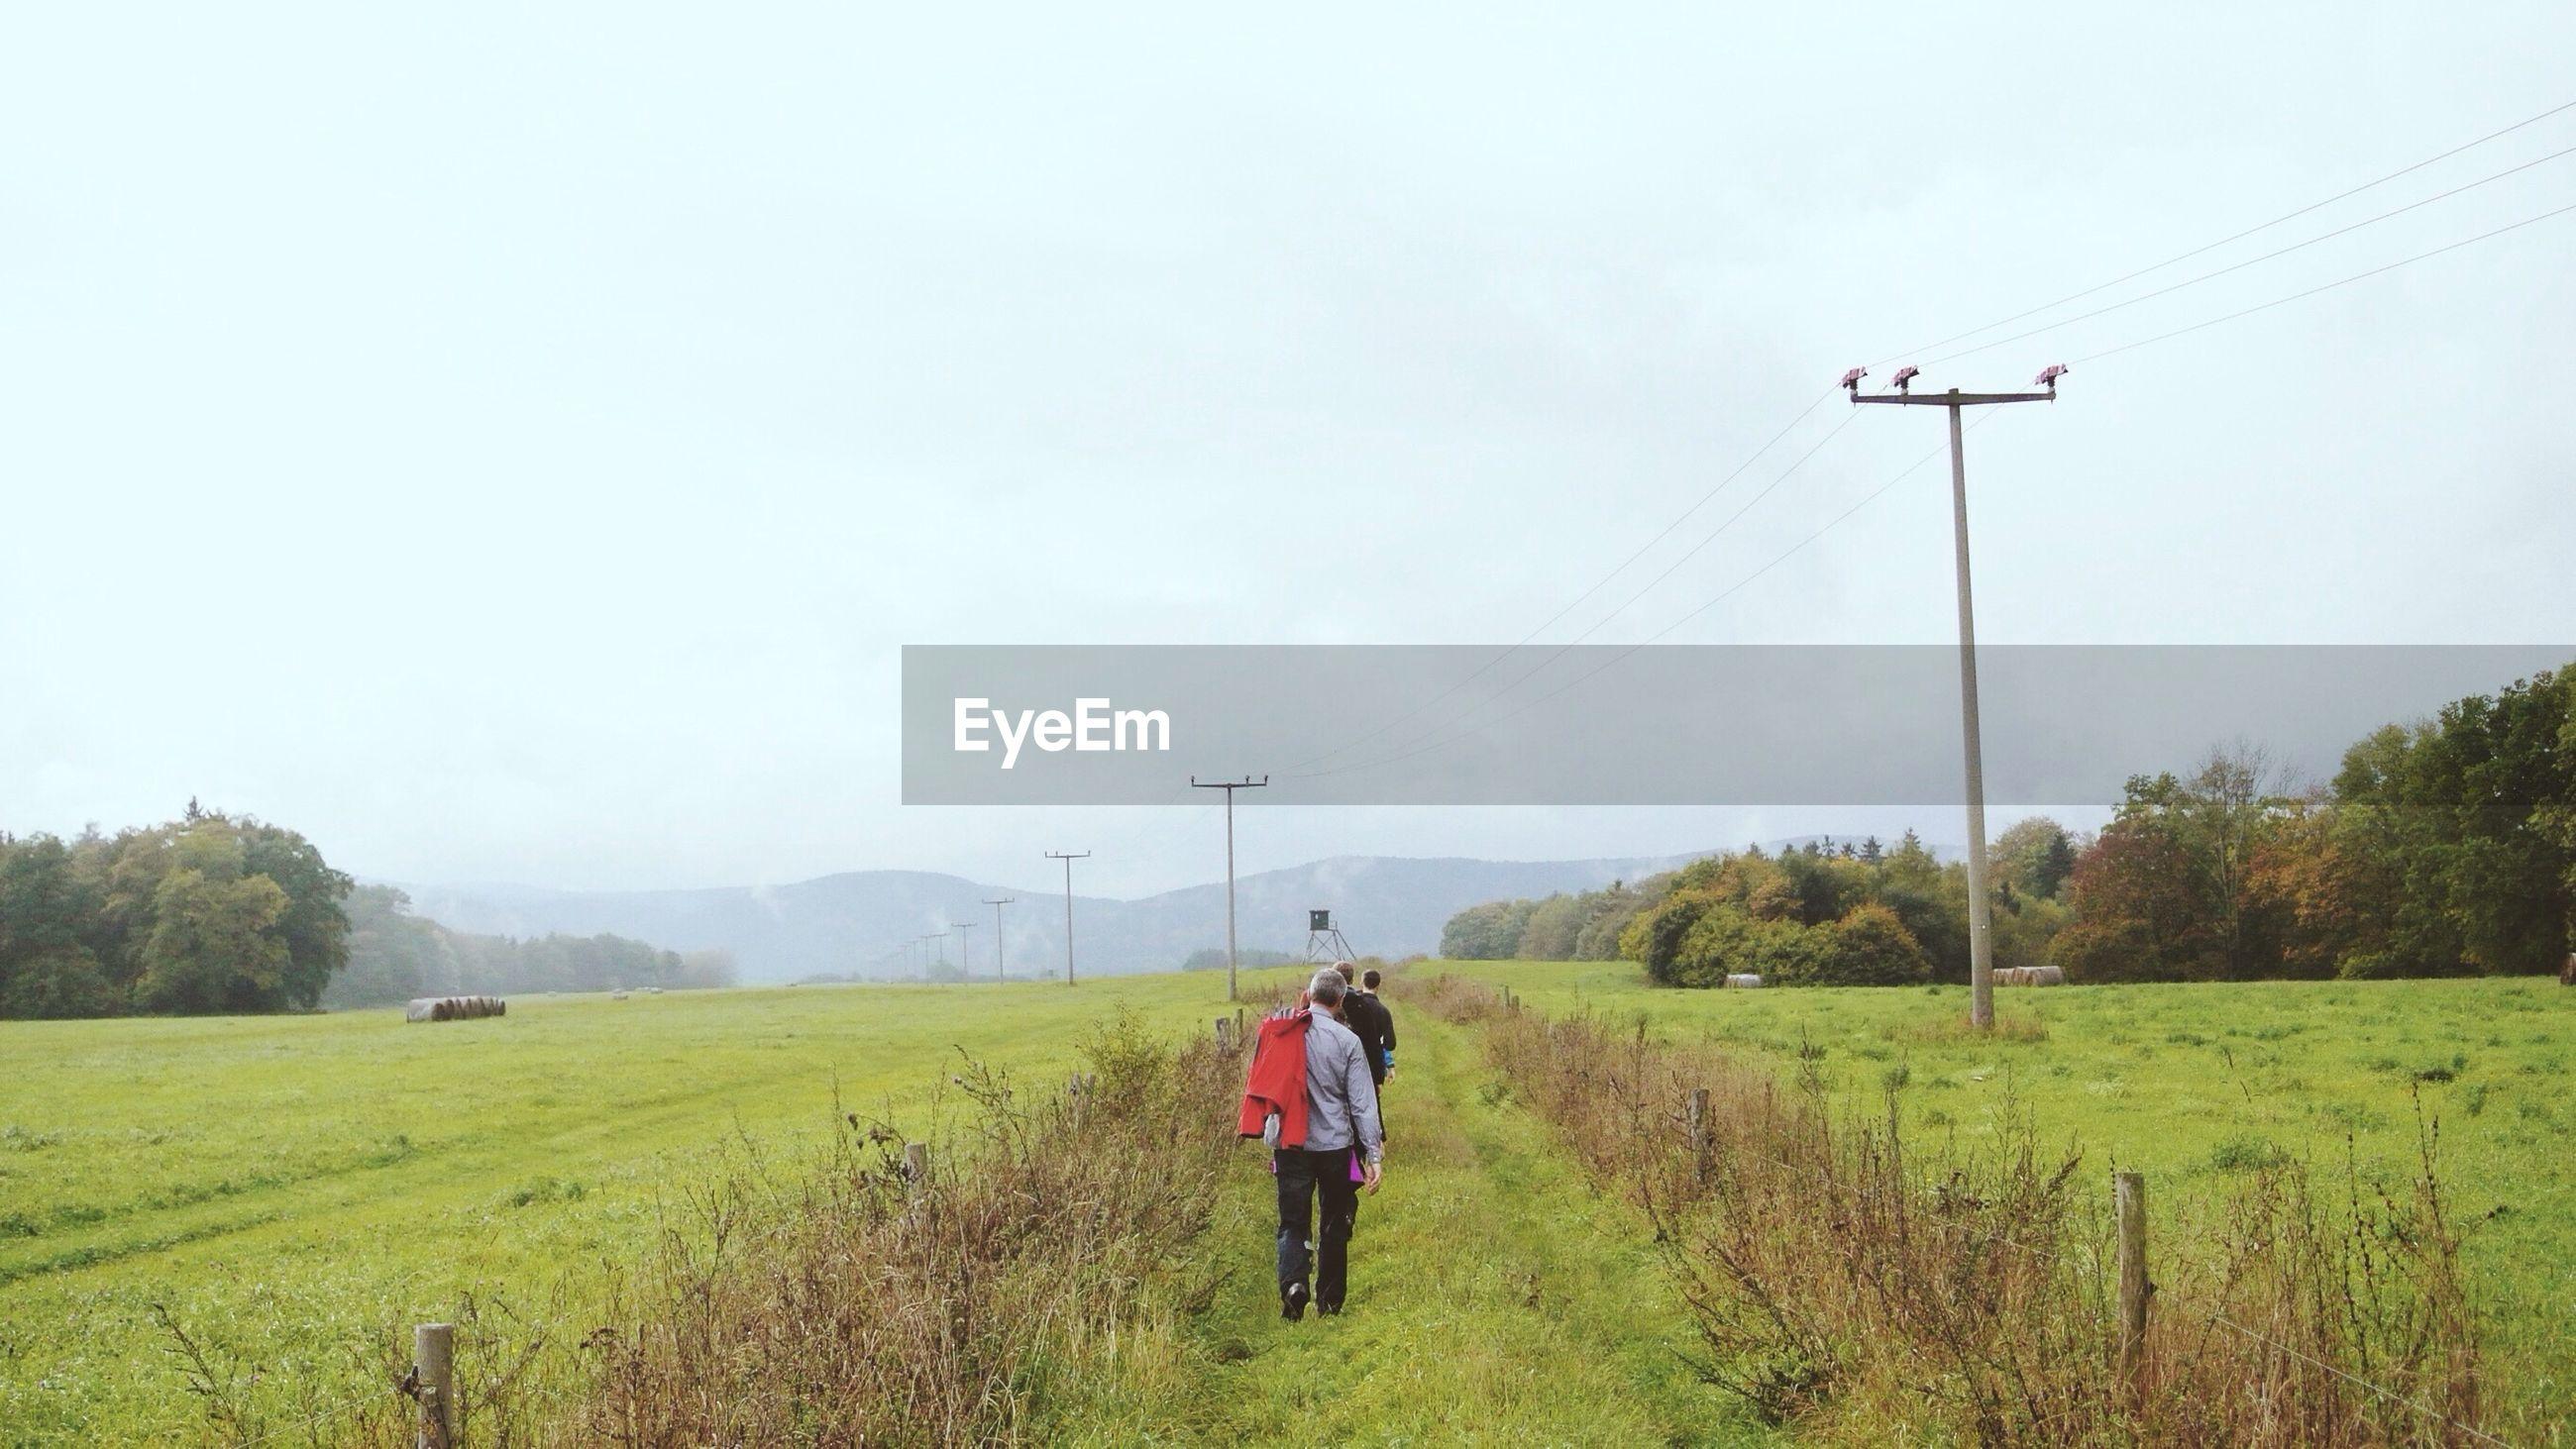 Rear view of people walking on grassy field against sky